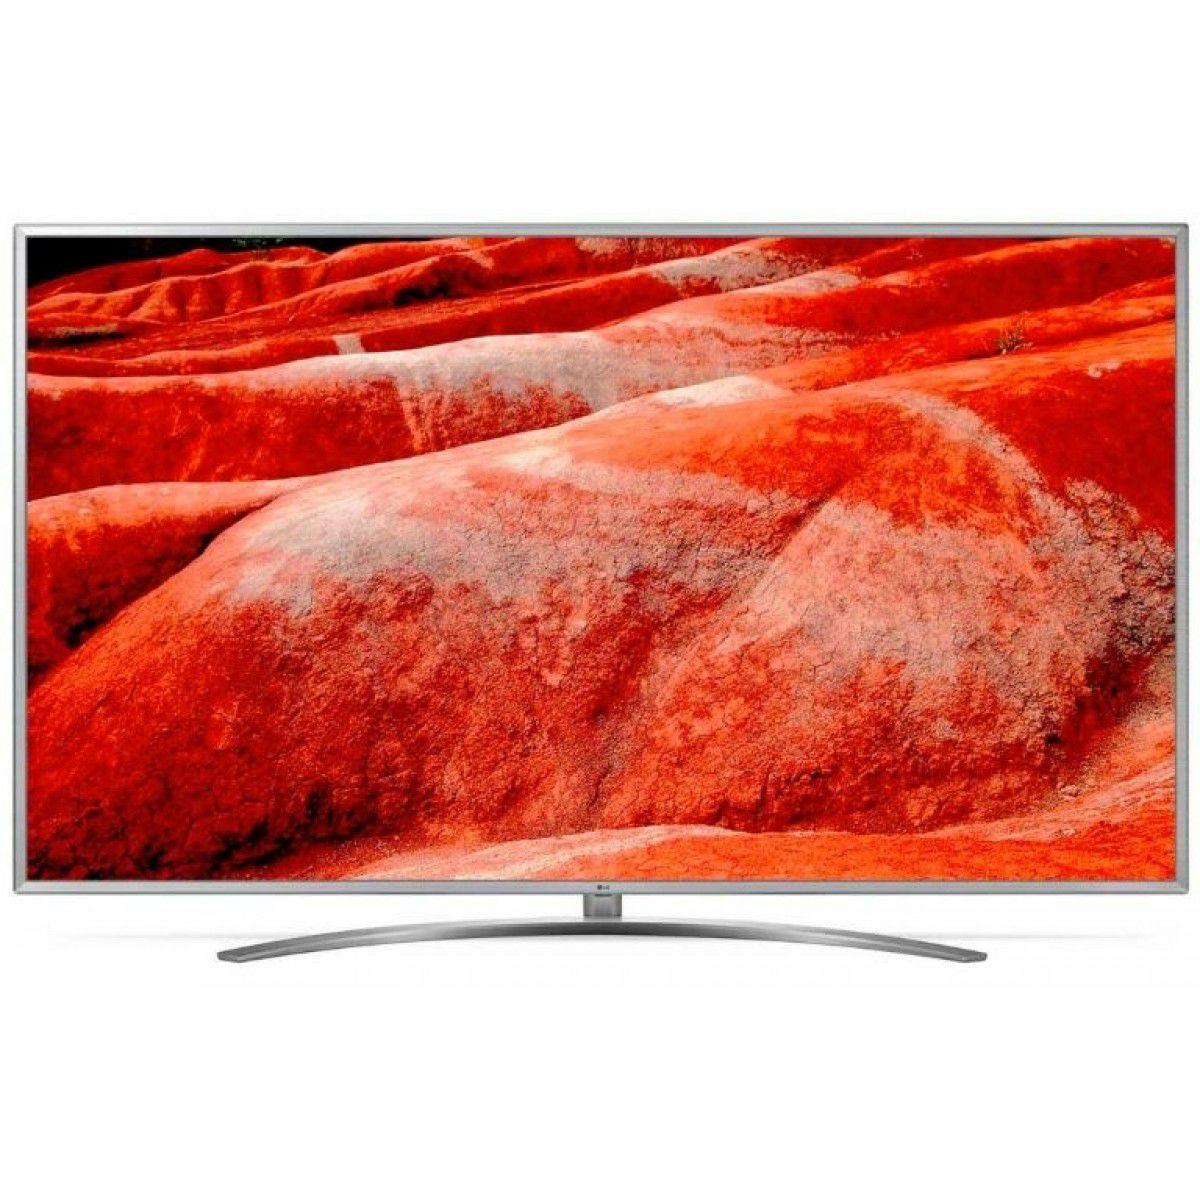 "LG 86UM7600PLB 86"" A7 Gen 2, Active HDR, 4K TV £2,499 at Reliant Direct"